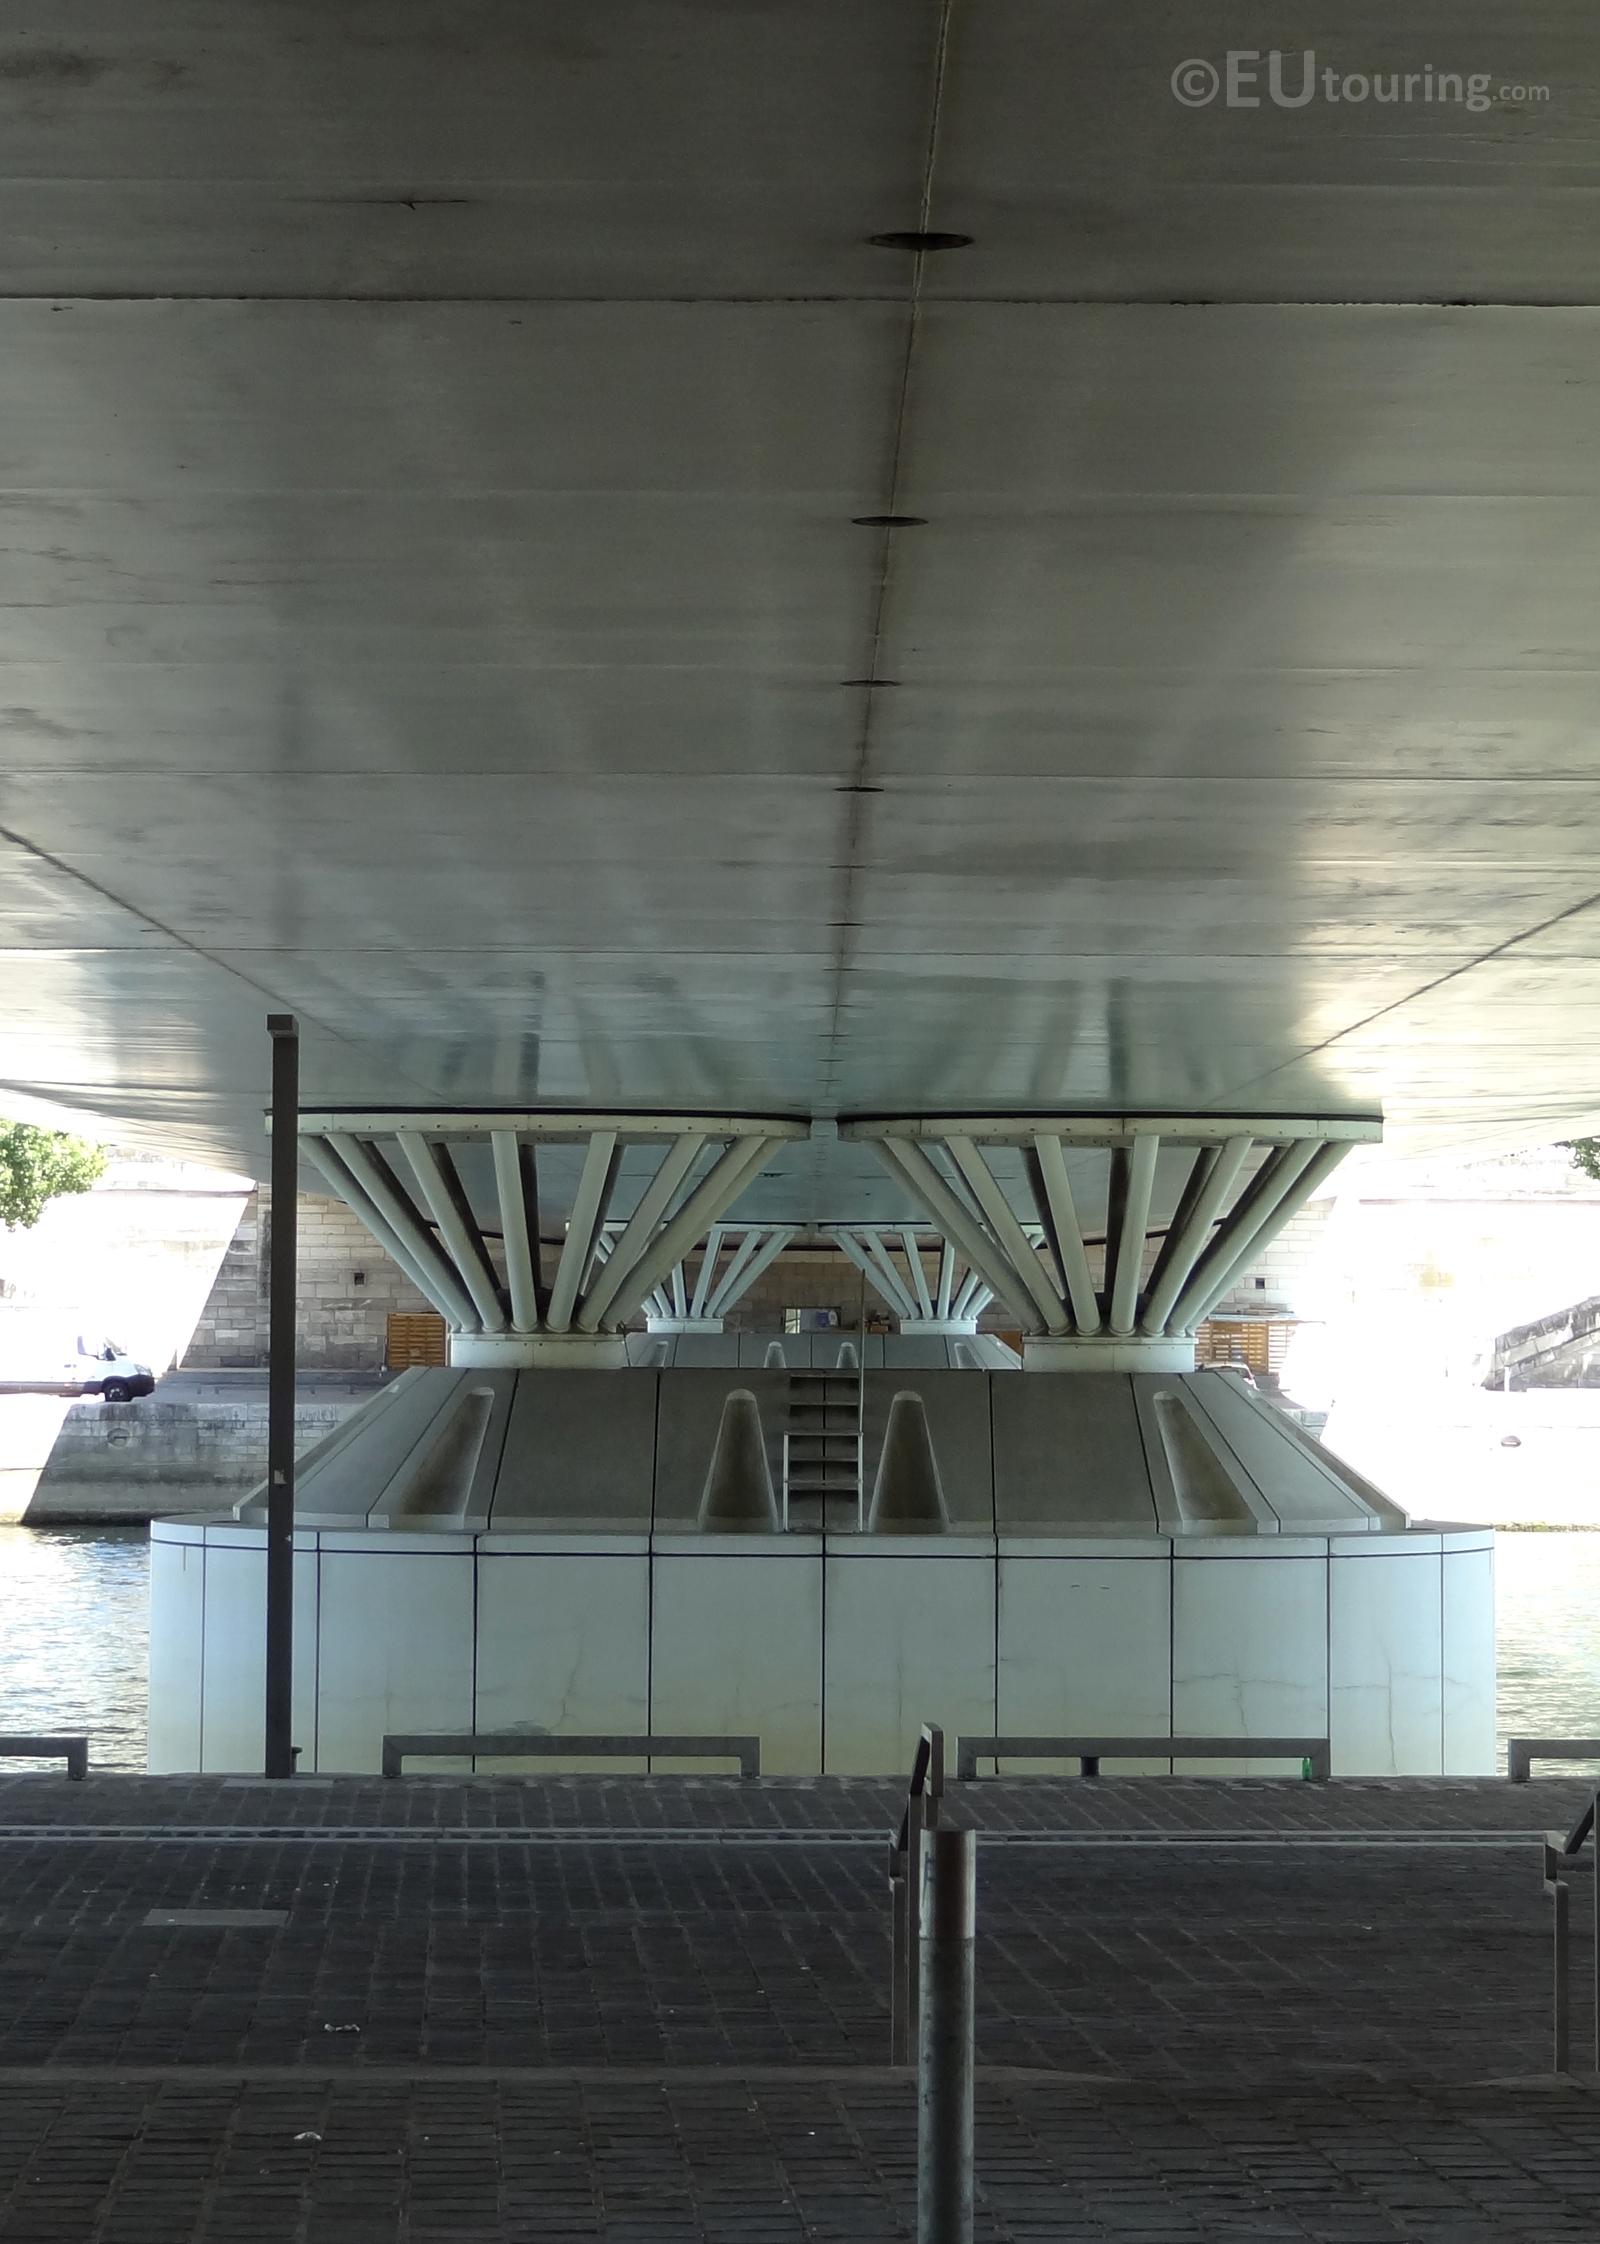 Architecture beneath the bridge